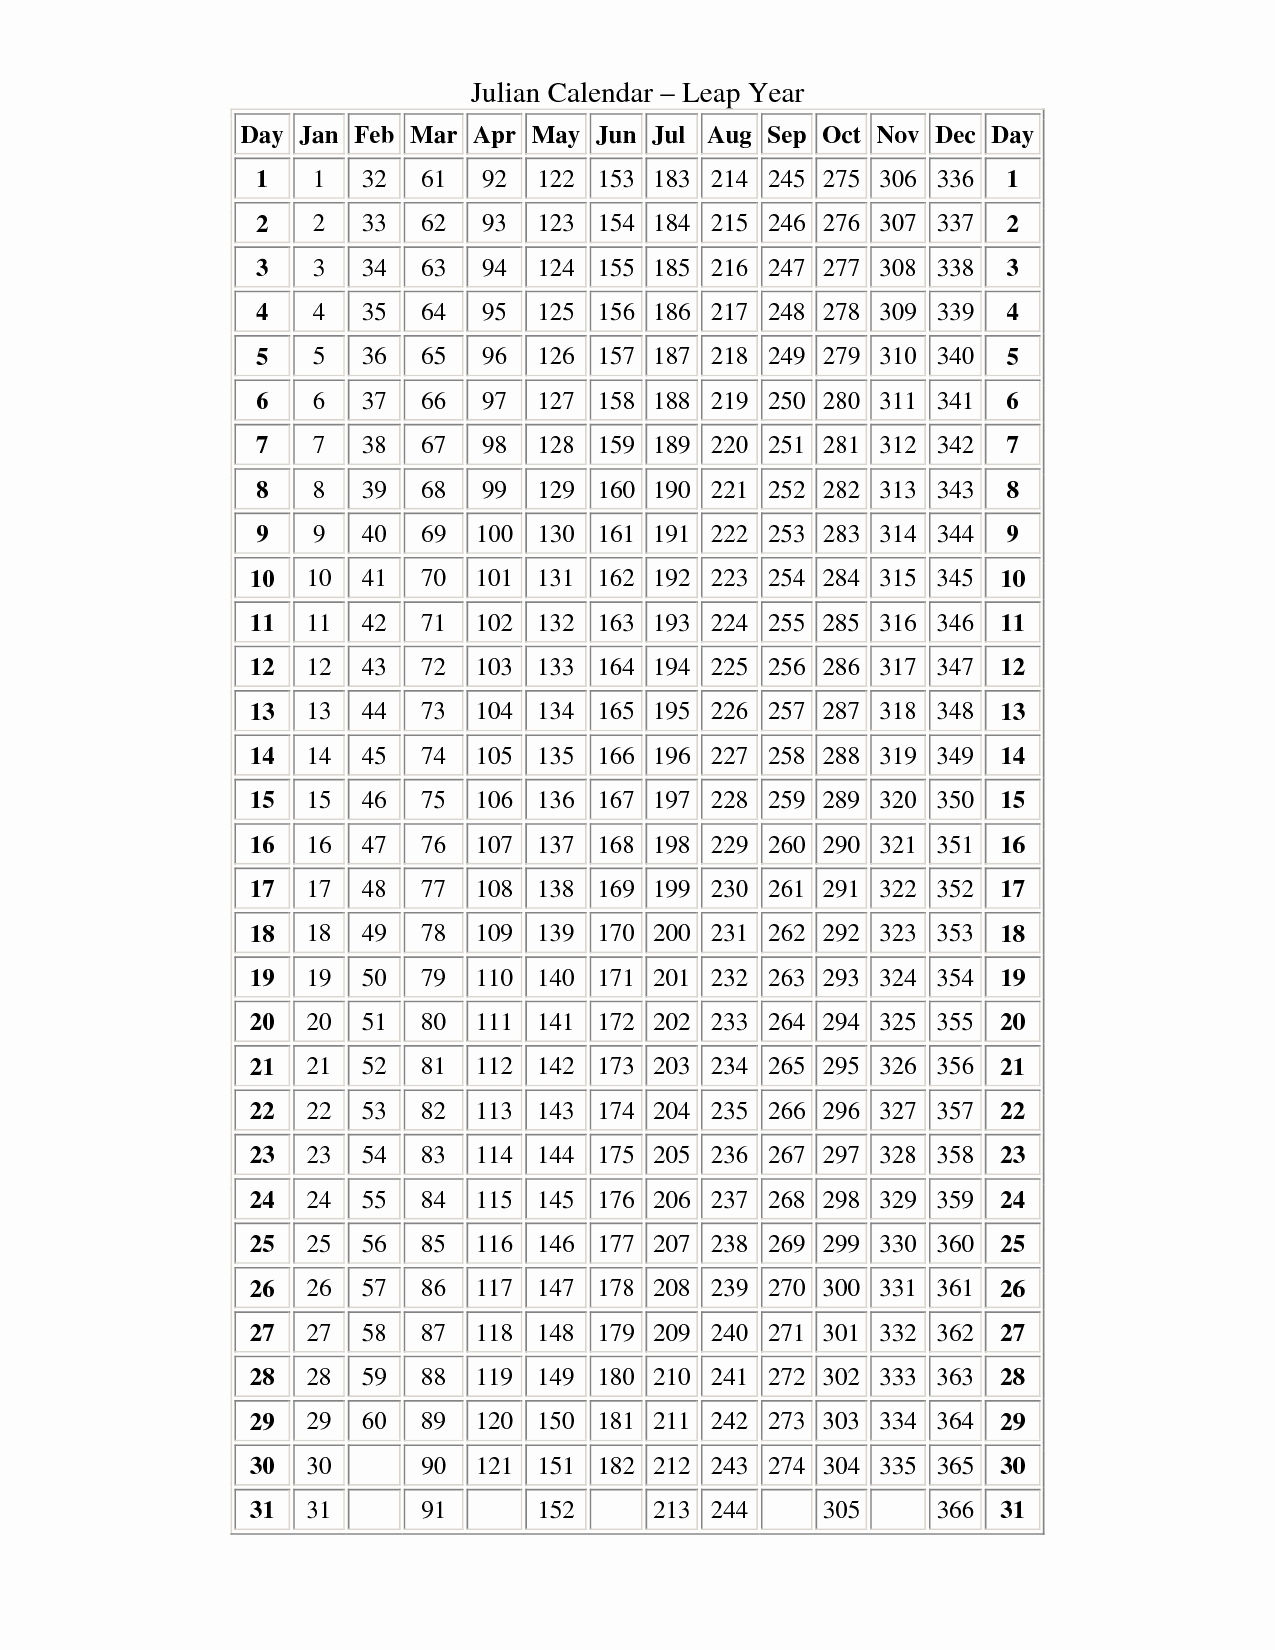 Leap Year Julian Calendar Pdf - Calendar Inspiration Design inside 2020 Calendar With Julian Dates For Leap Year Printable